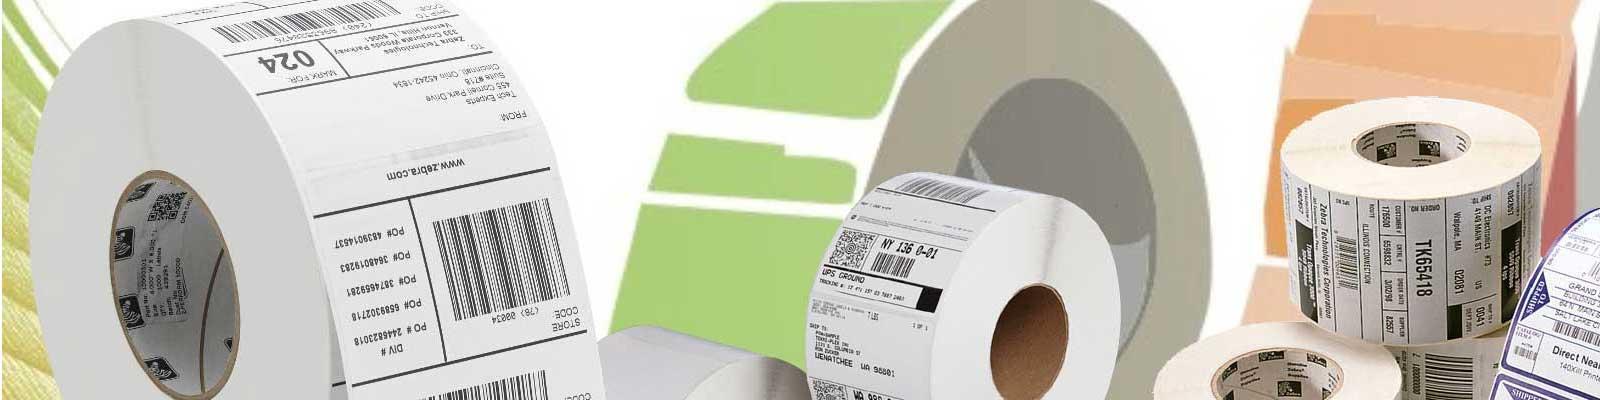 Etiquetas Impresoras Honeywell